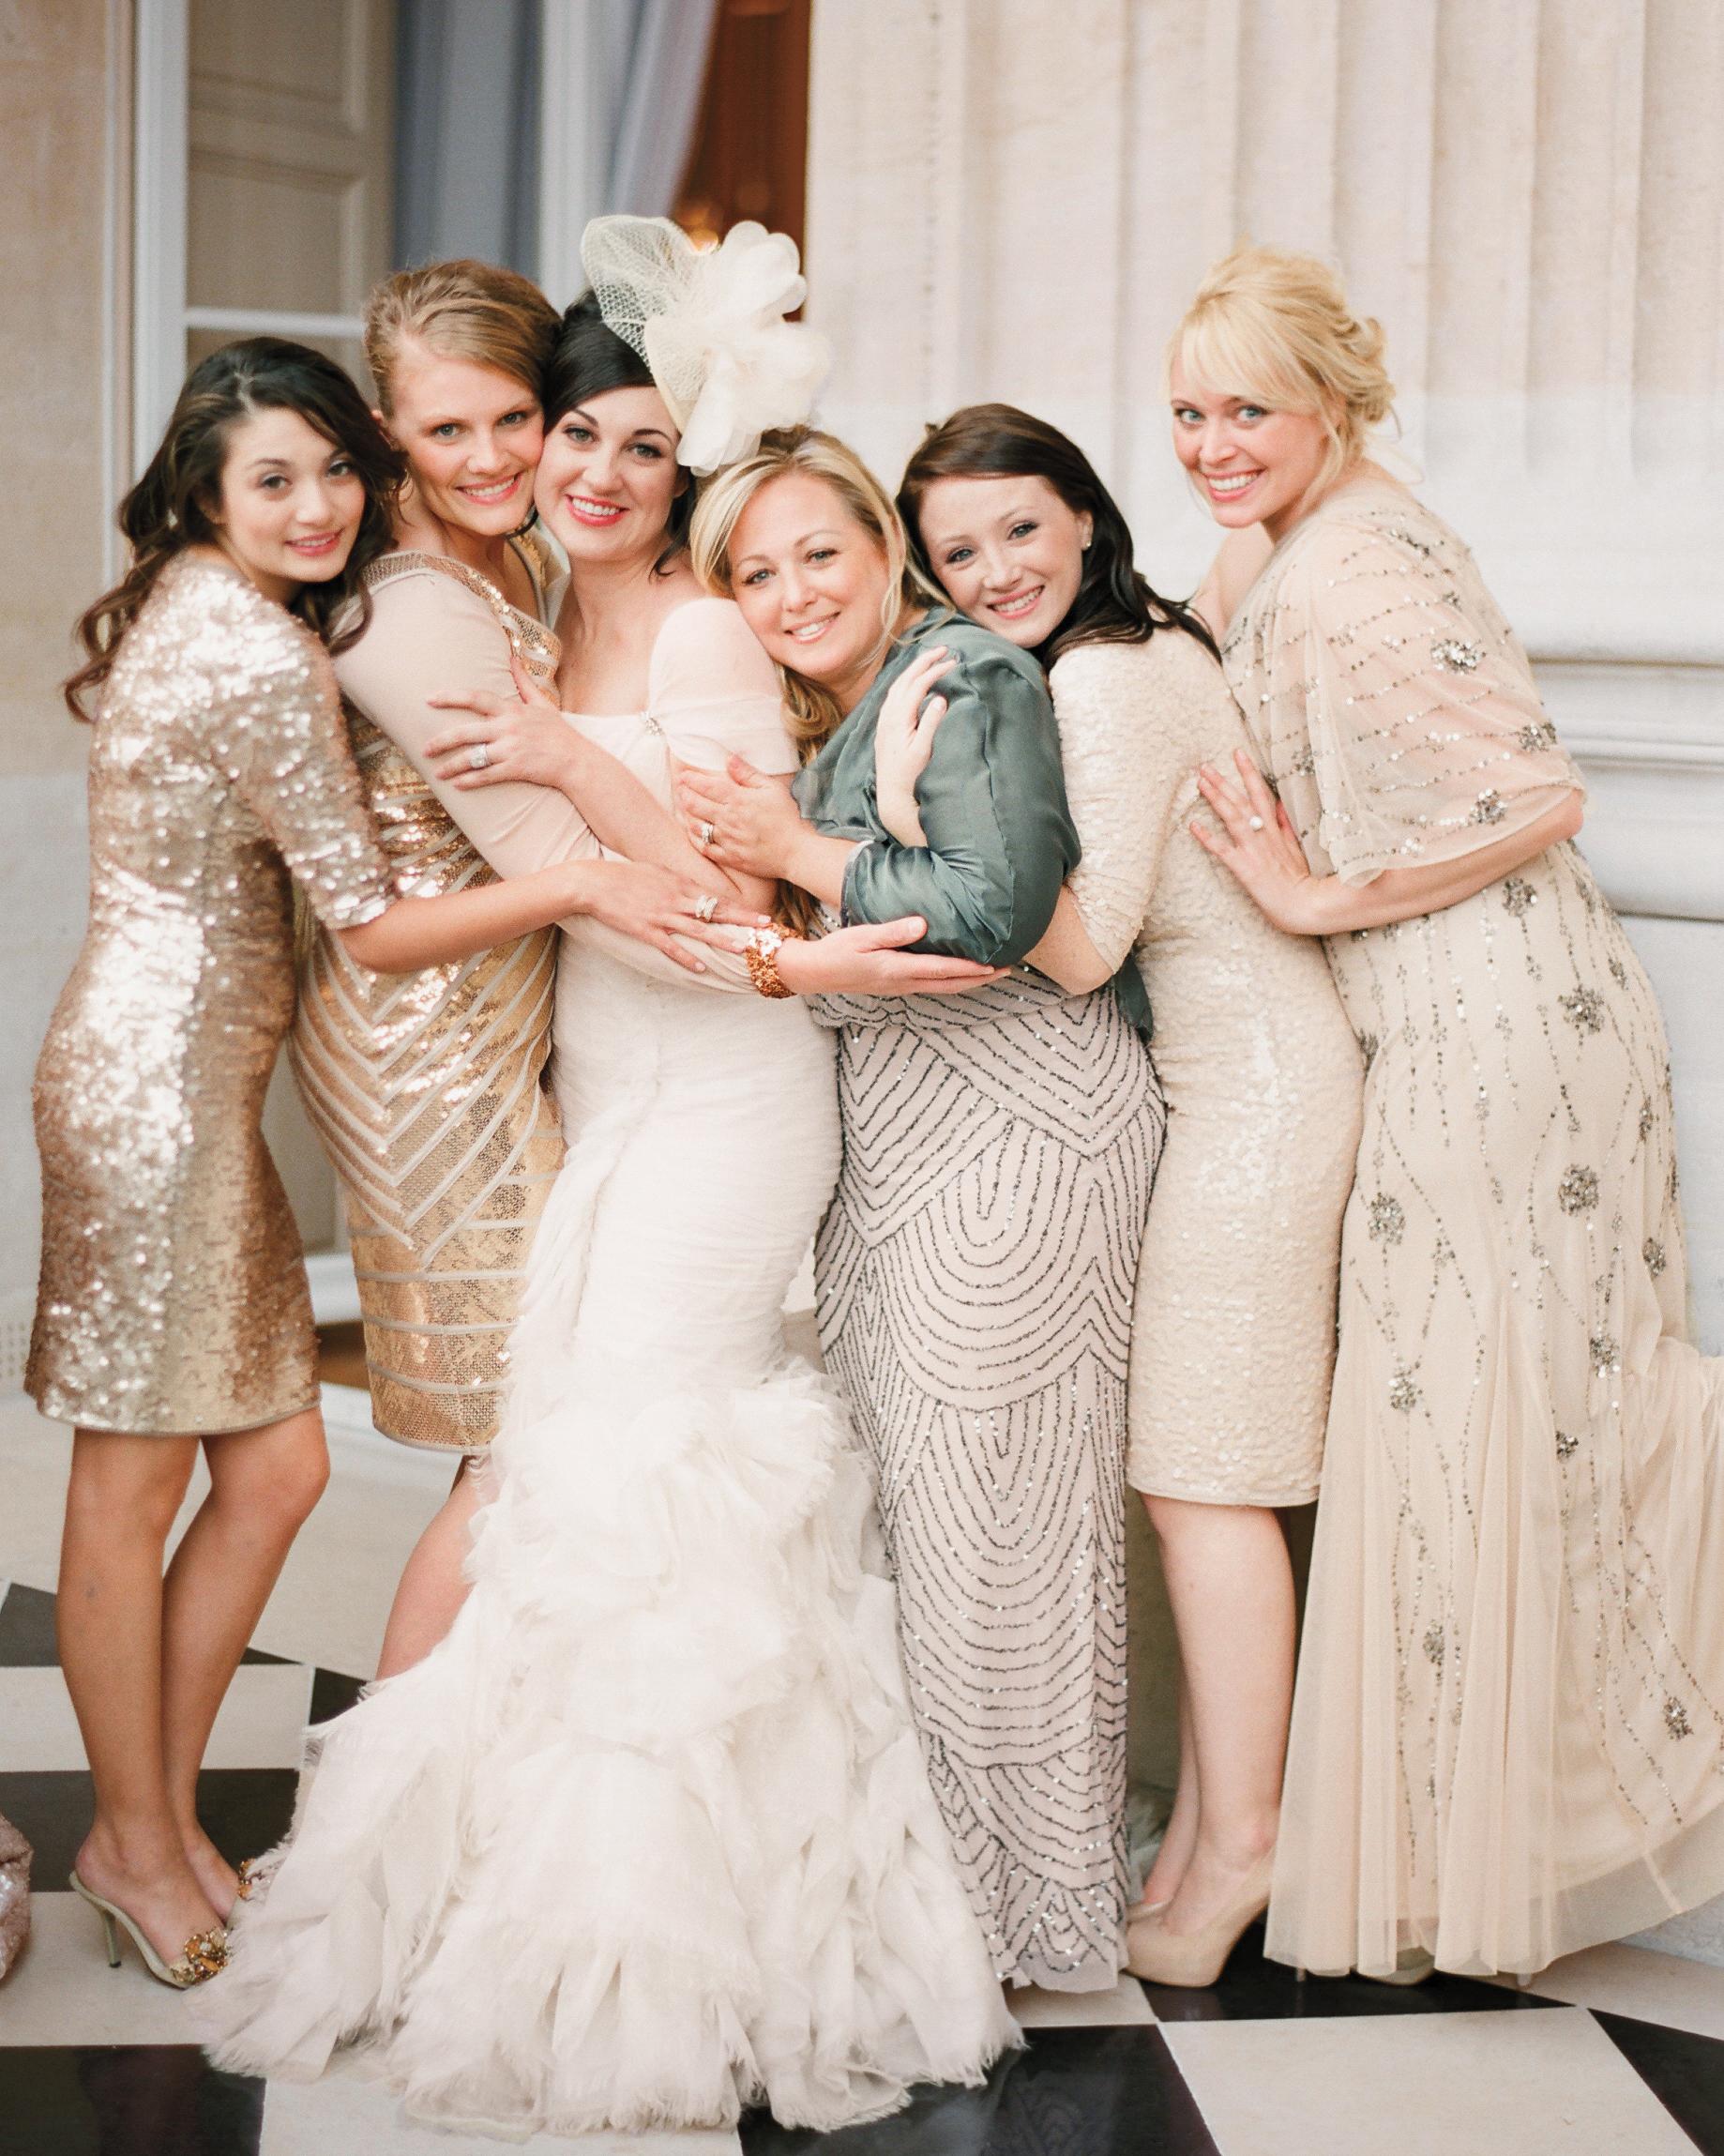 julie-eric-bridesmaids-1279-mwds109913.jpg